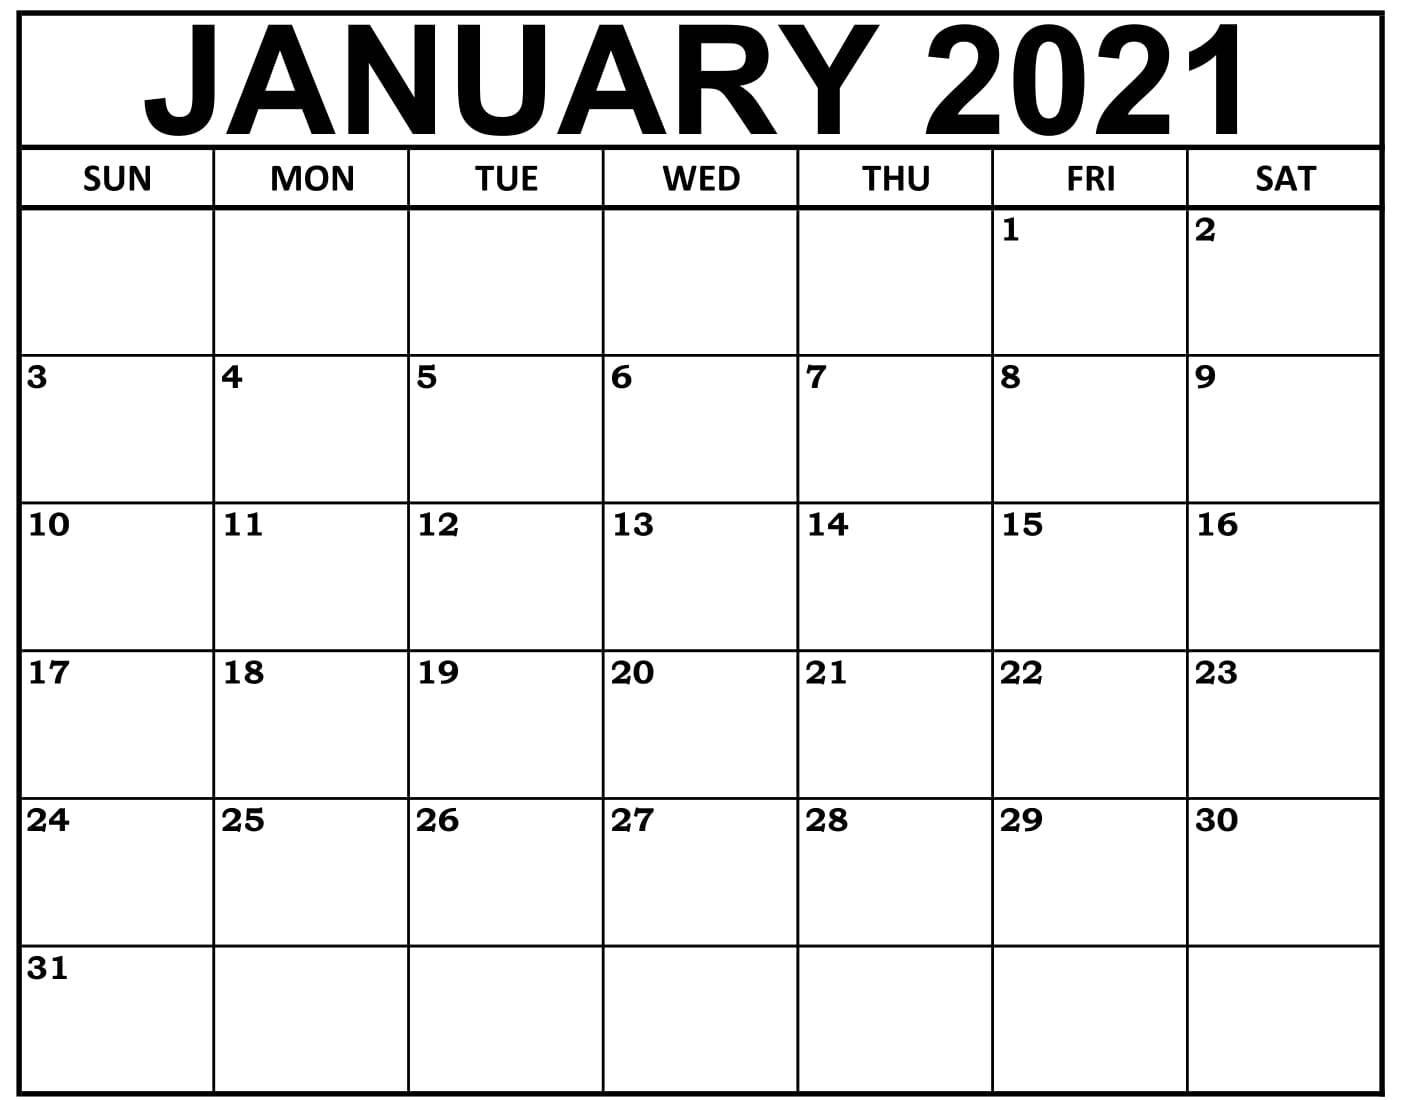 January 2021 Calendar Canada With National Holidays - Set